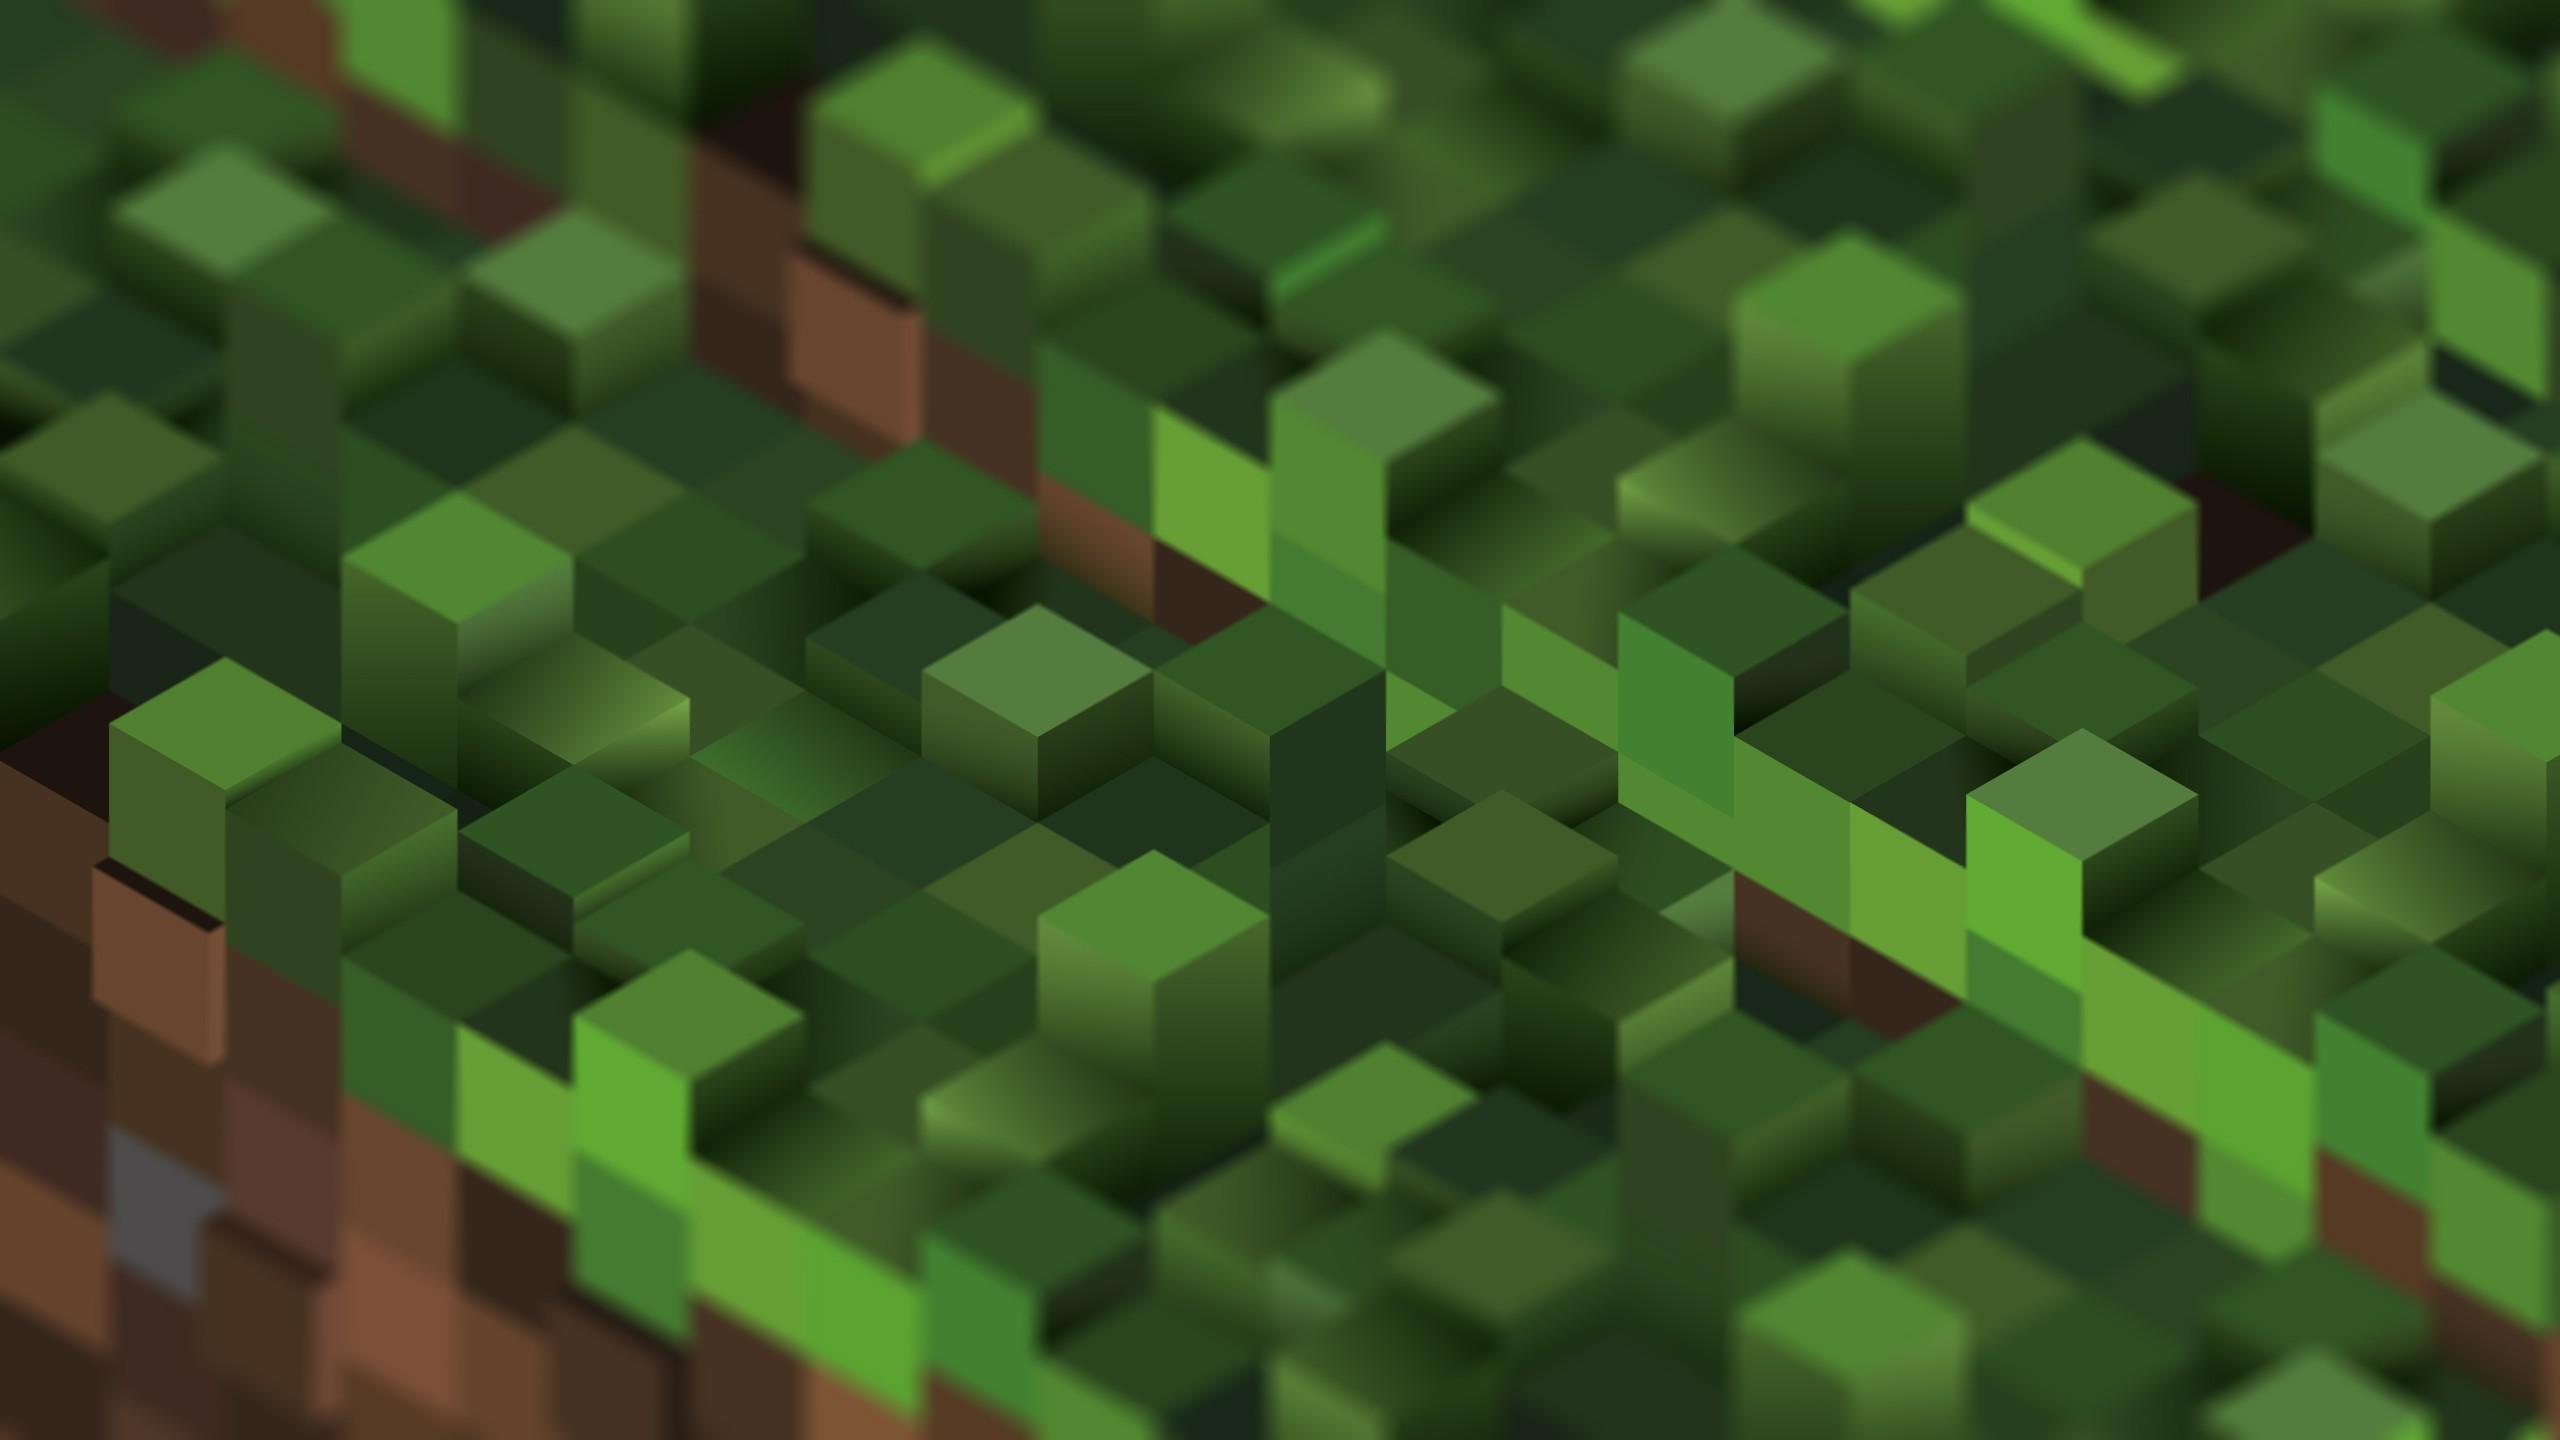 Minecraft Hd Wallpaper Background Image 2560x1440 Id